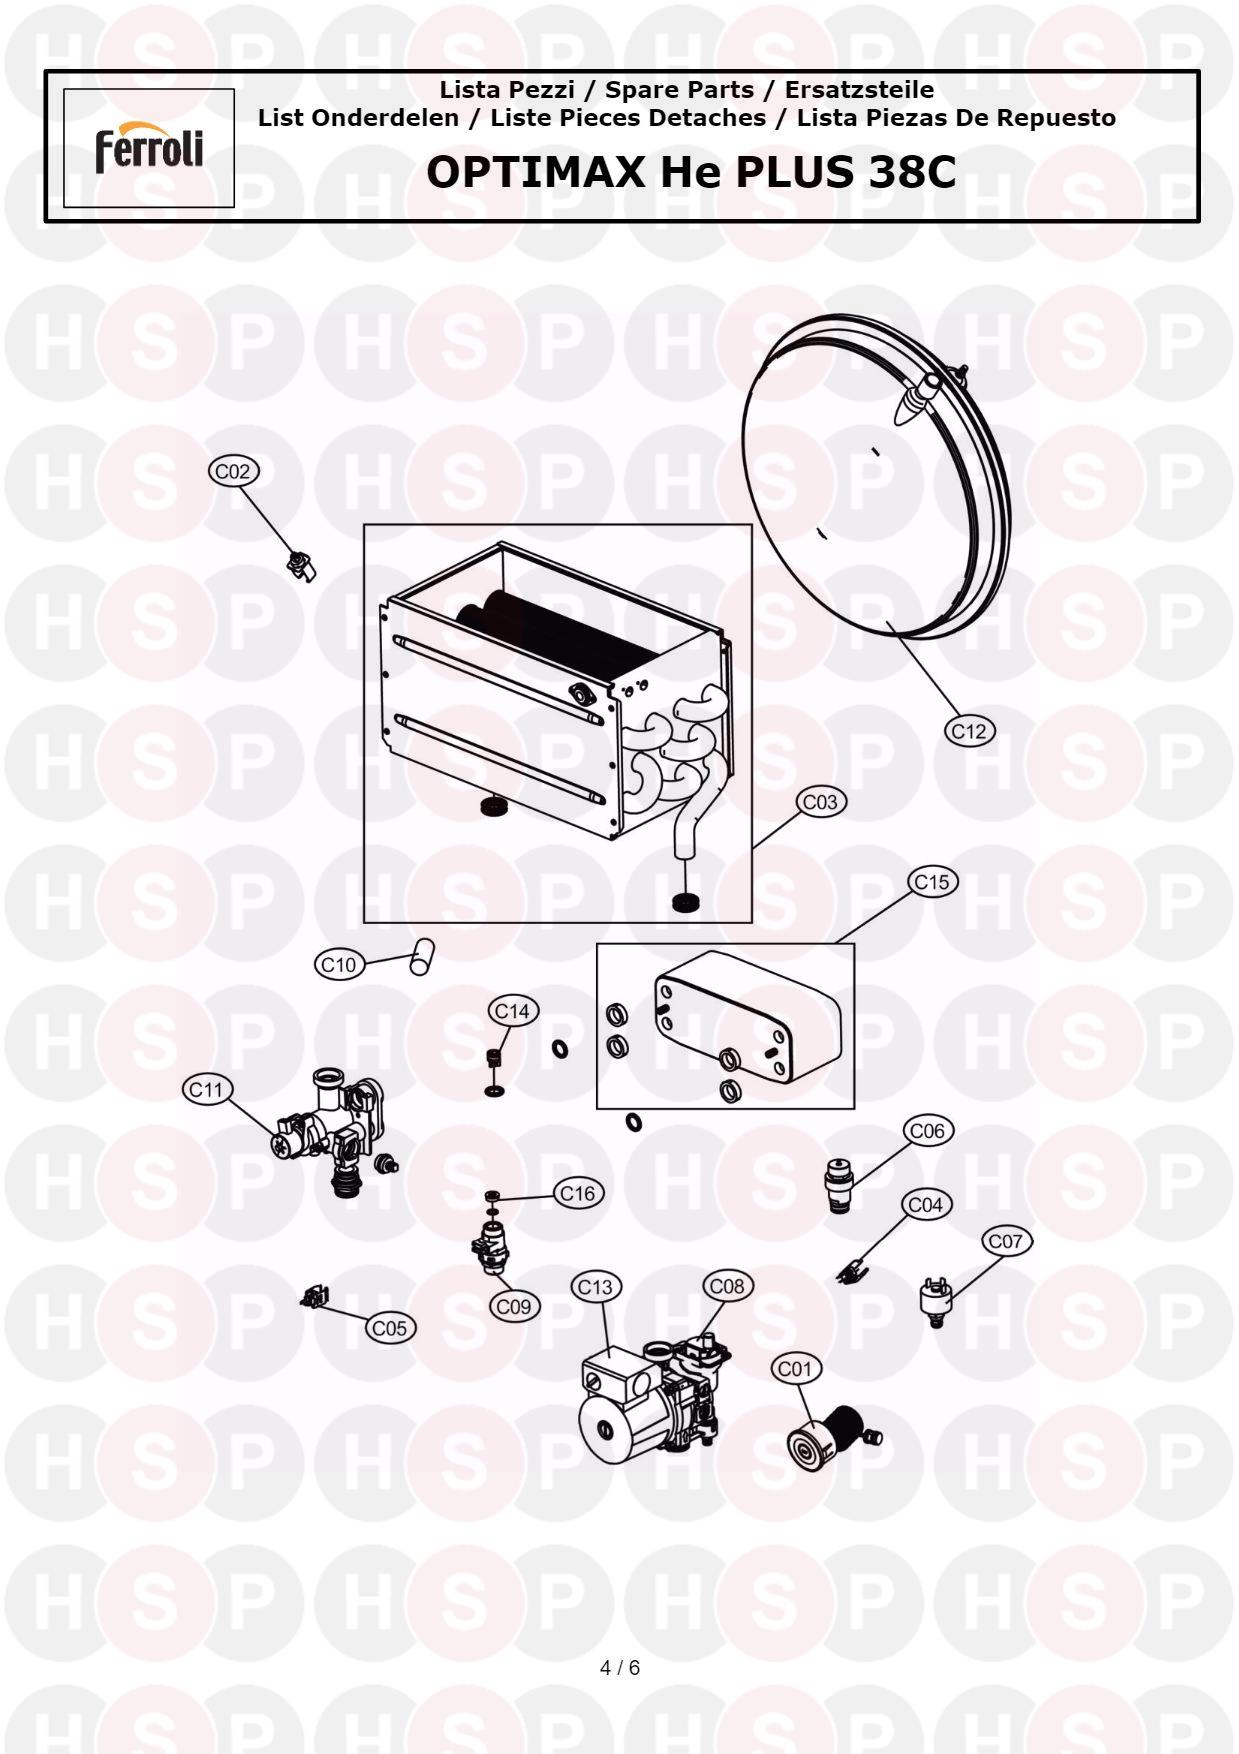 FERROLI OPTIMAX HE 38C BOILER COMPLETE PUMP 39820900 Wilo